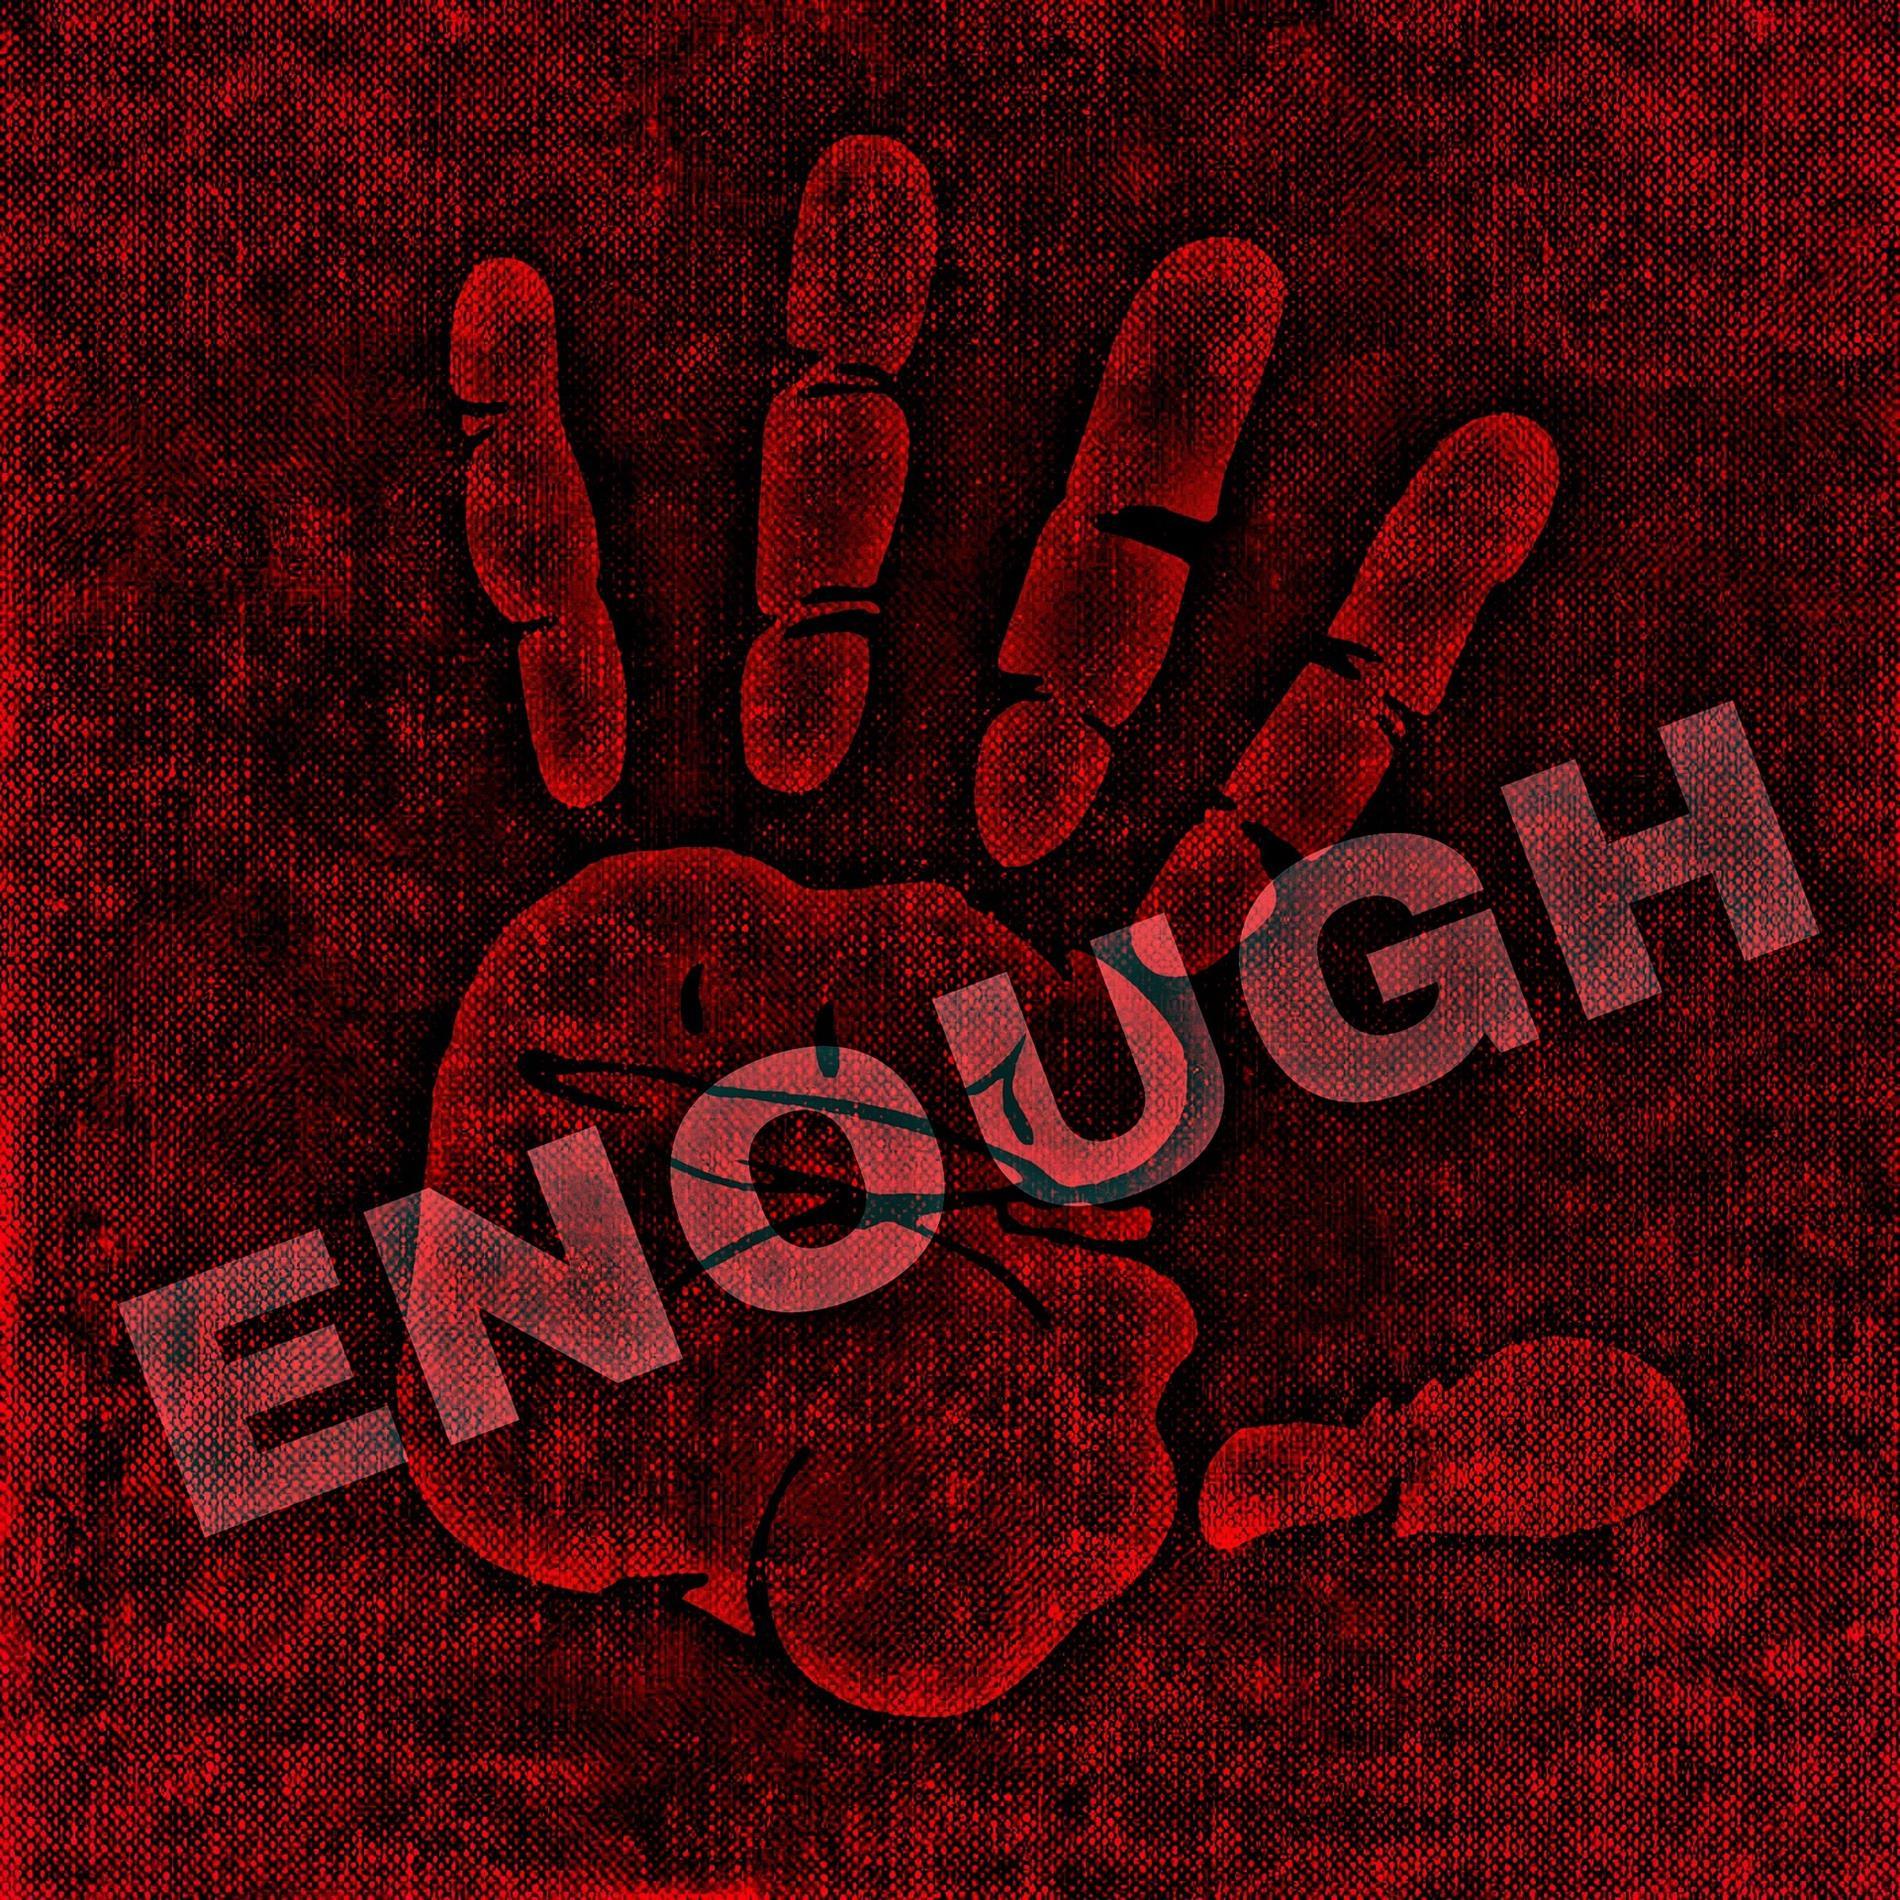 hand saying enough